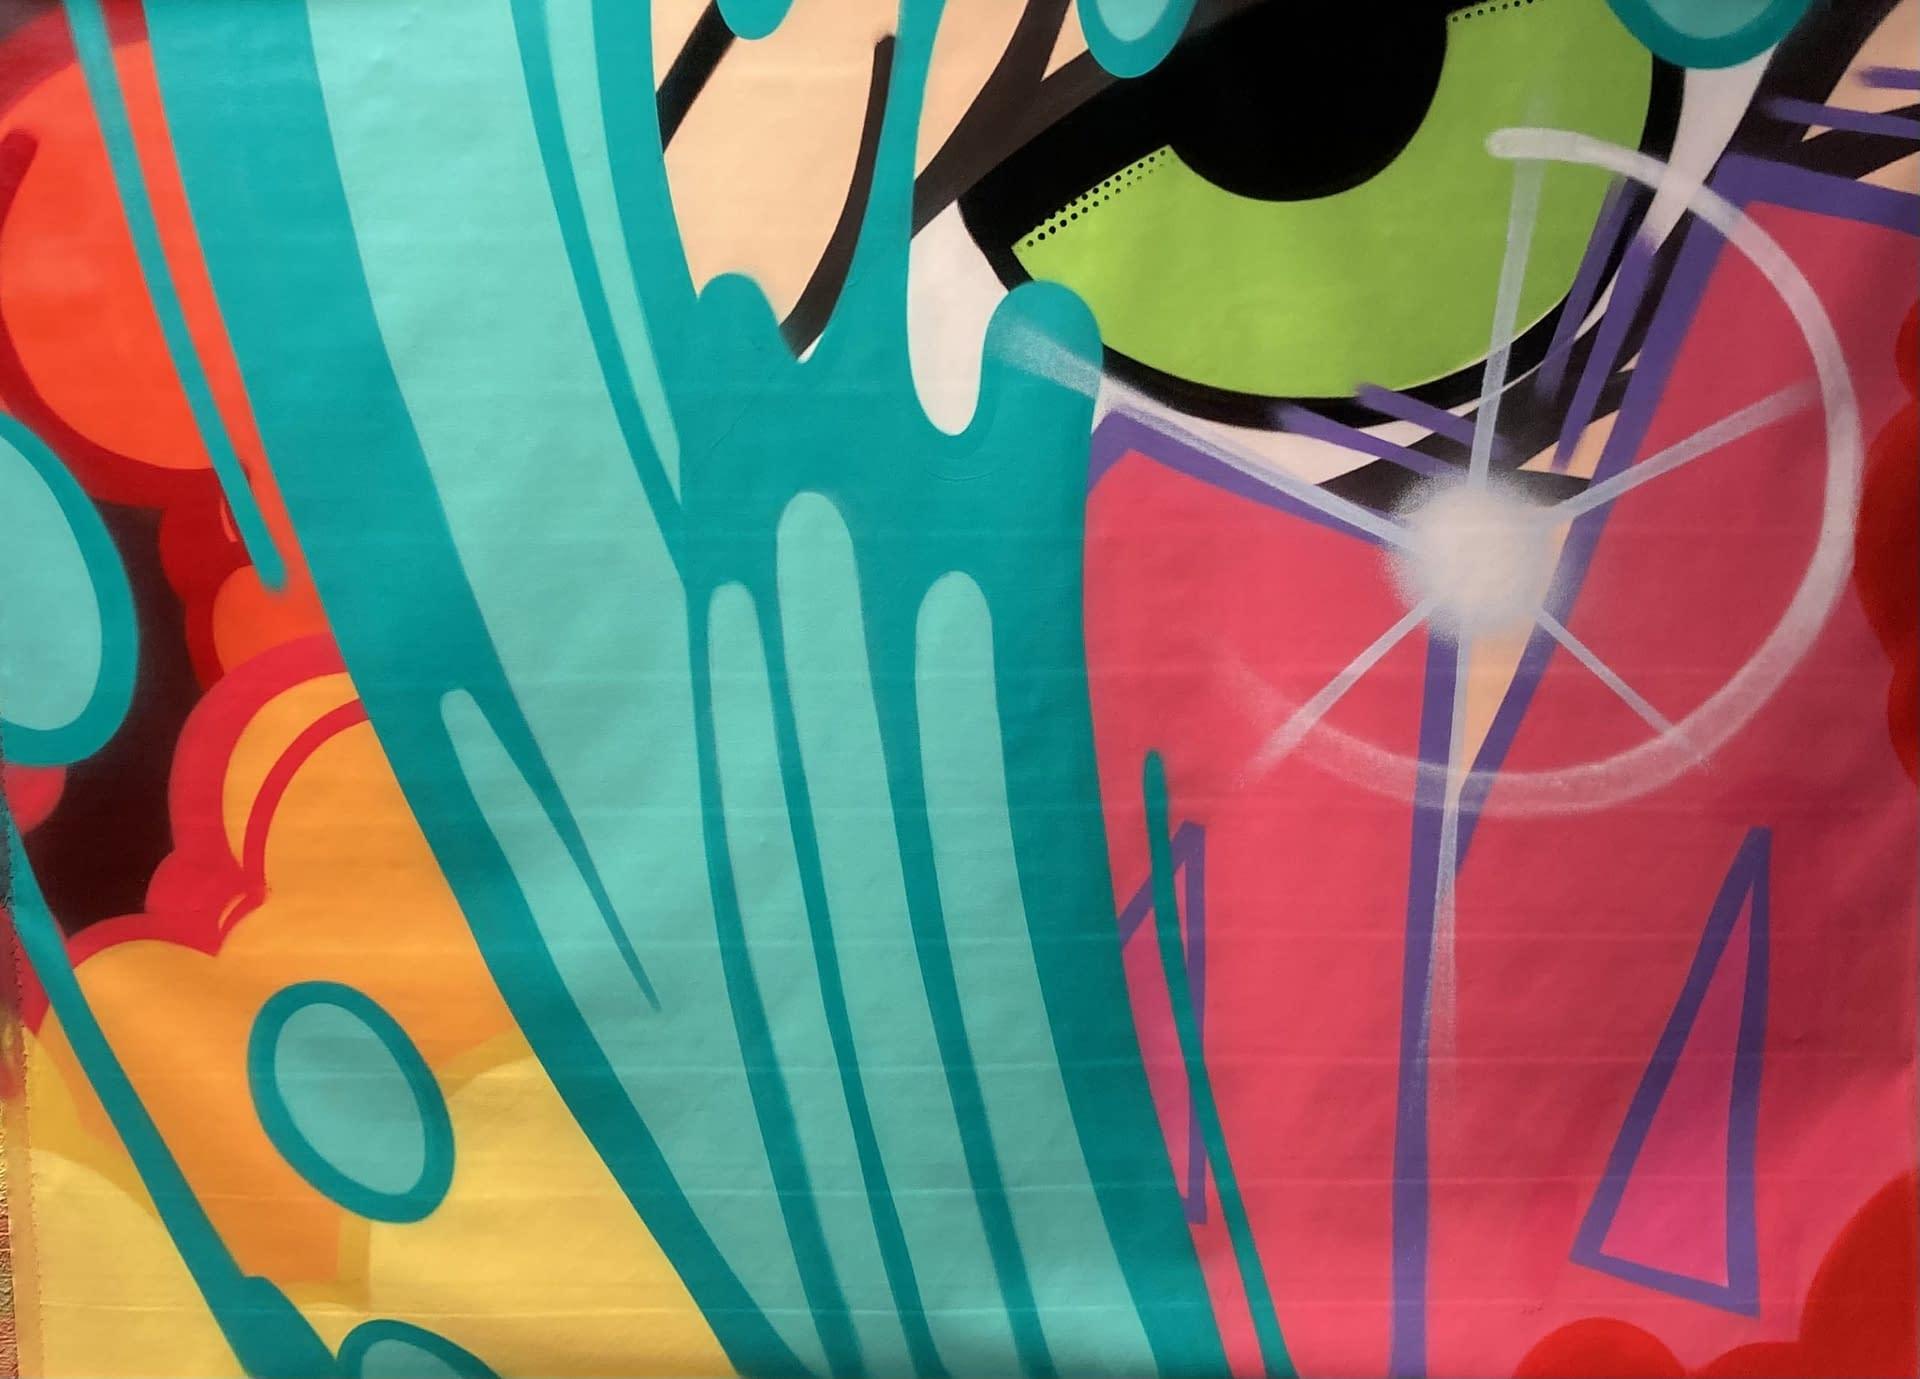 john crash matos joanne artman gallery spray paint graffiti art